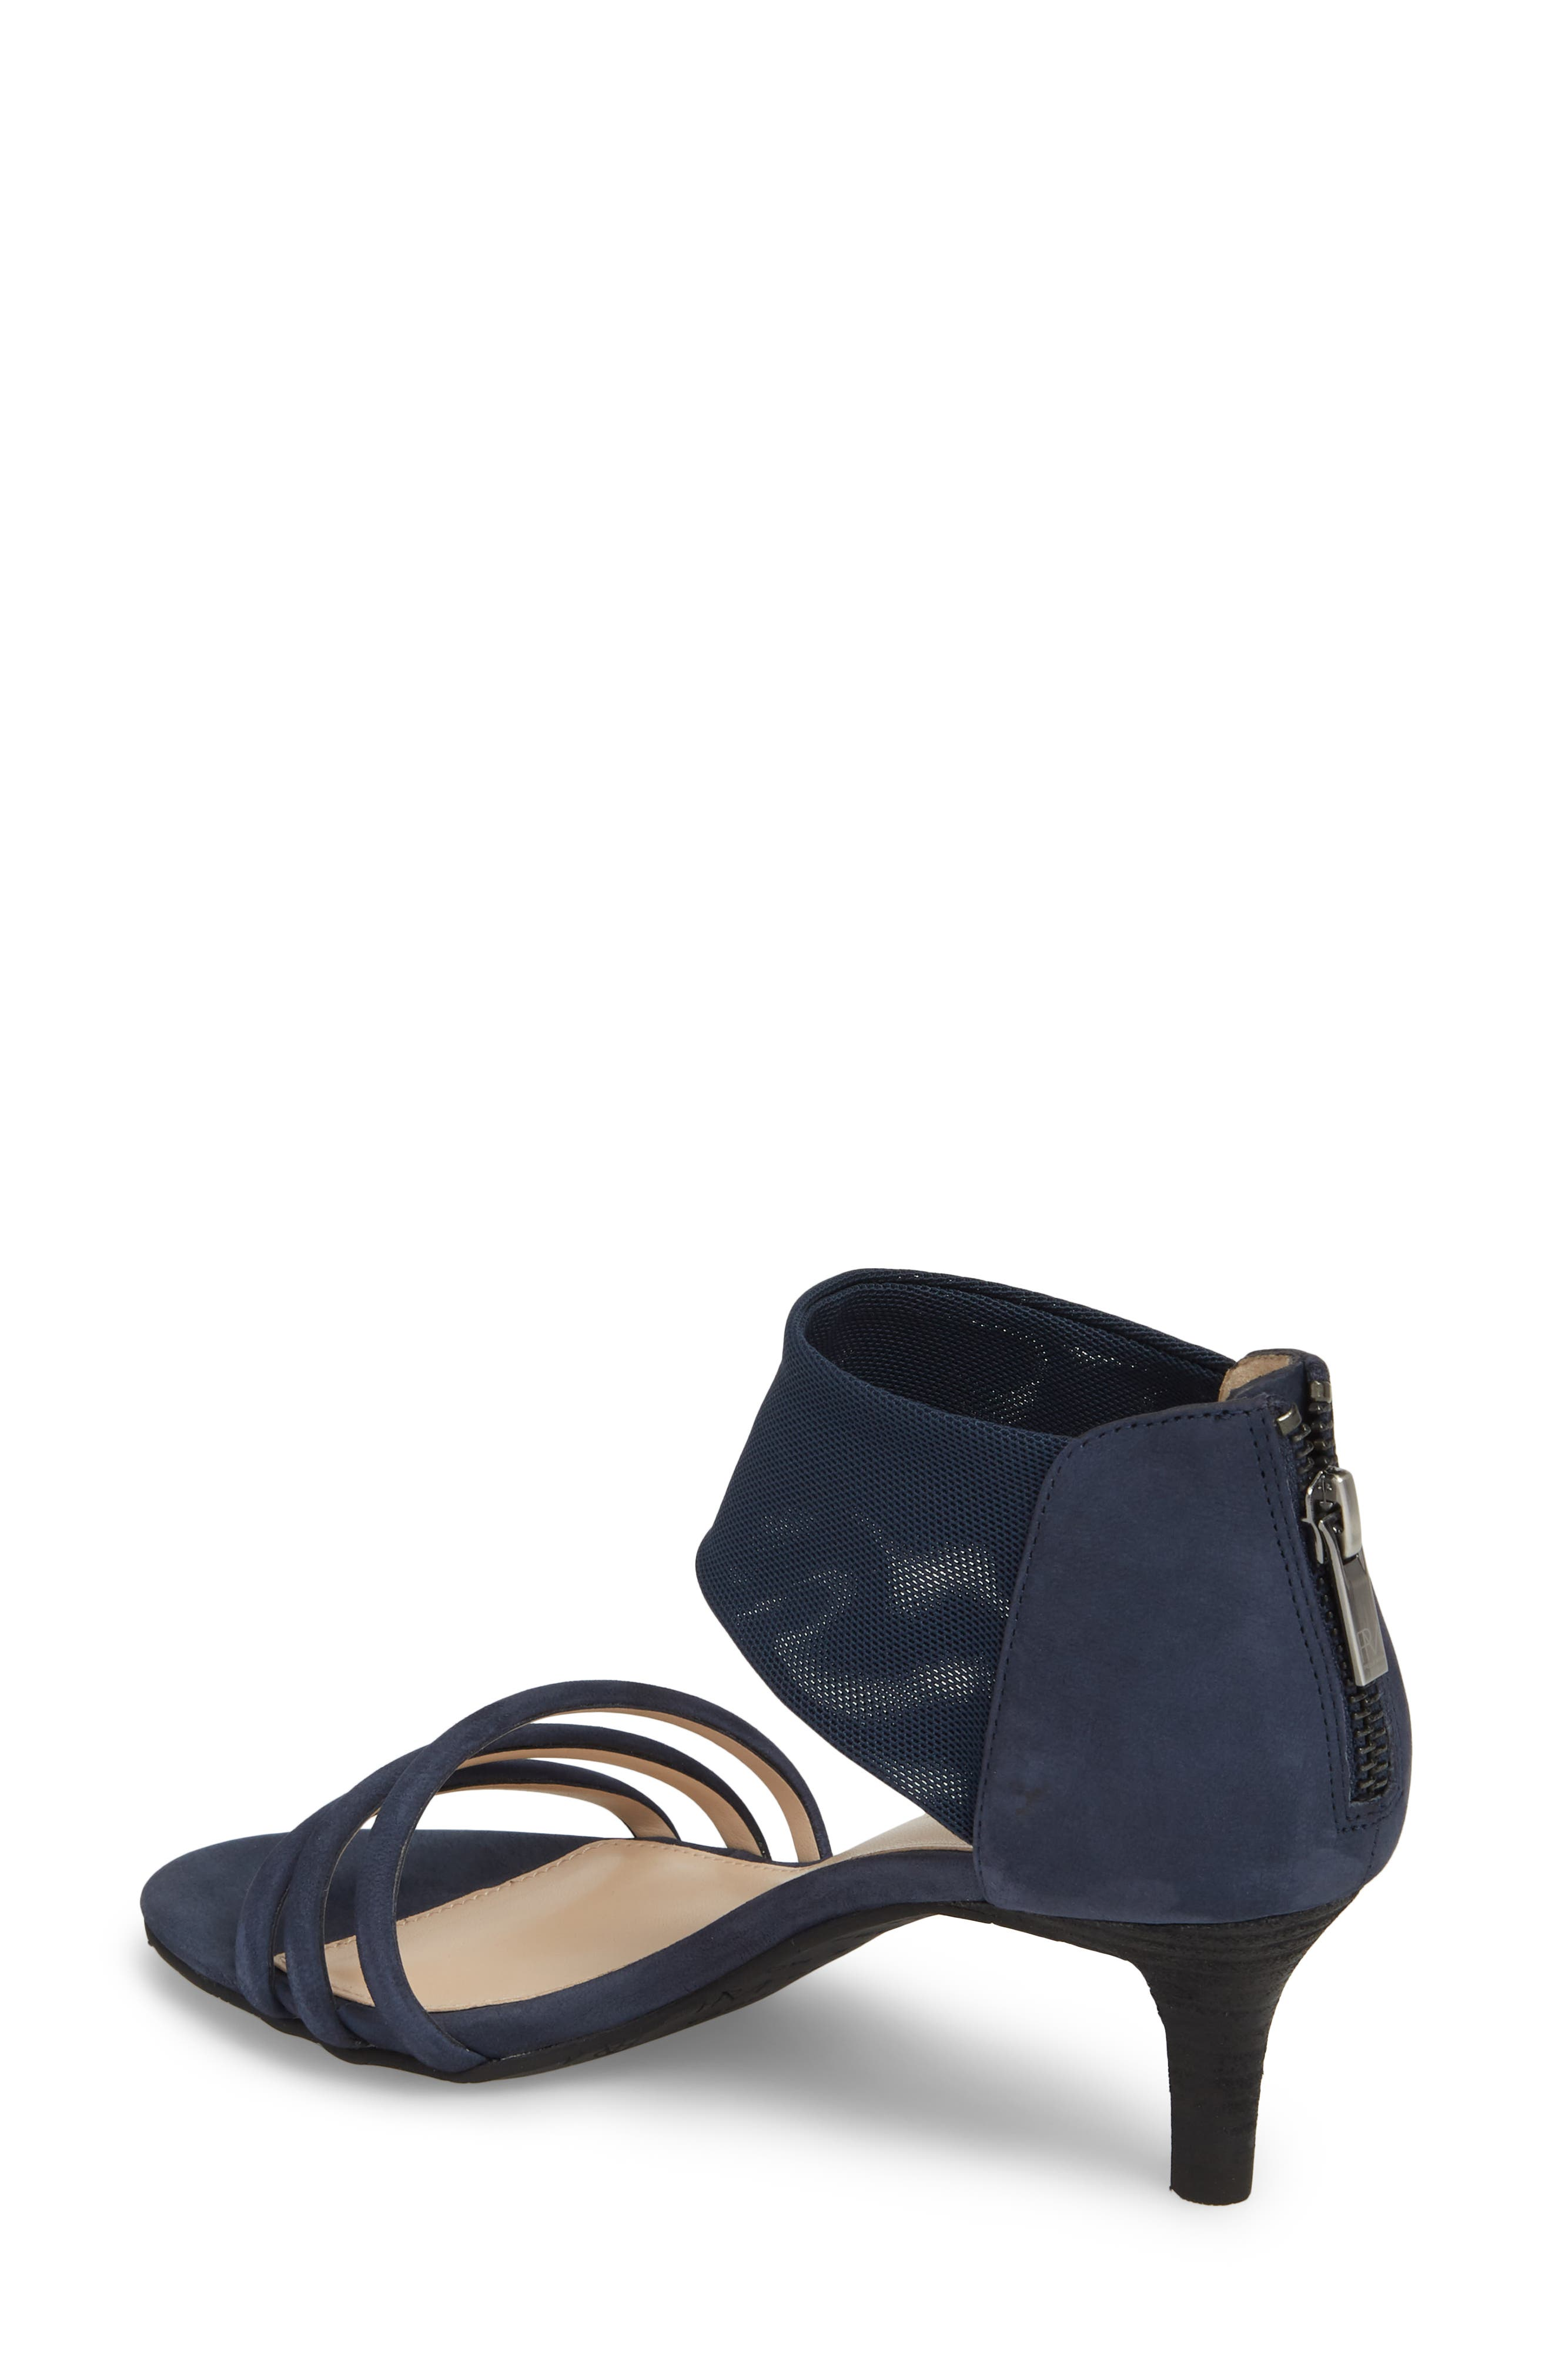 Berri Ankle Cuff Sandal,                             Alternate thumbnail 6, color,